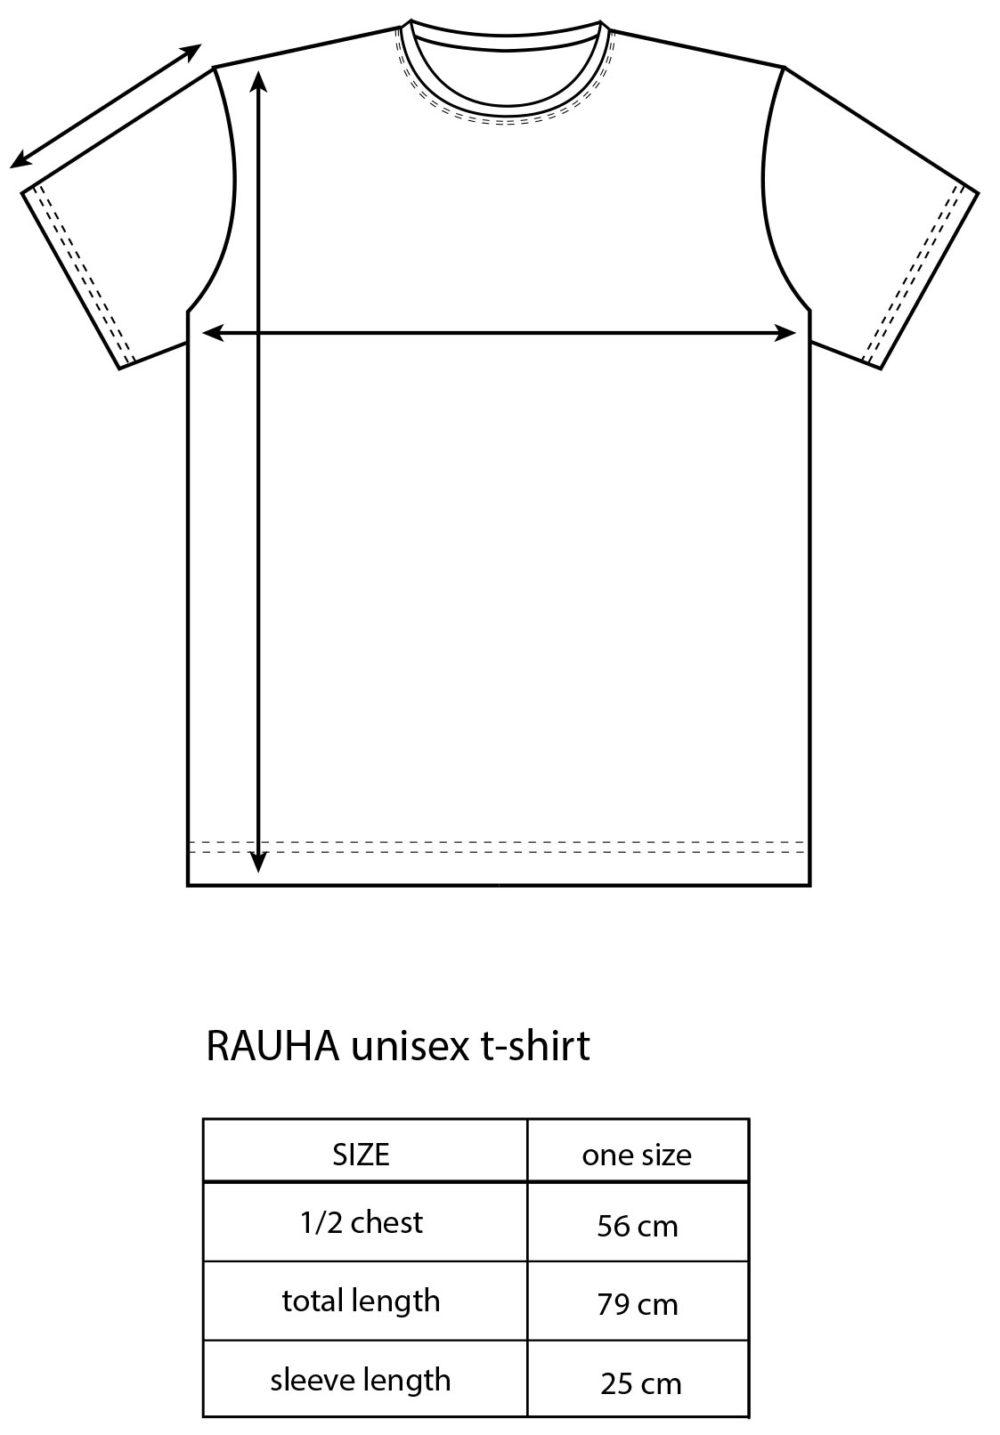 Vimma T-shirt Unisex RAUHA one-colored black Onesize - black, one-colored, Onesize, RAUHA, T-shirt / Unisex